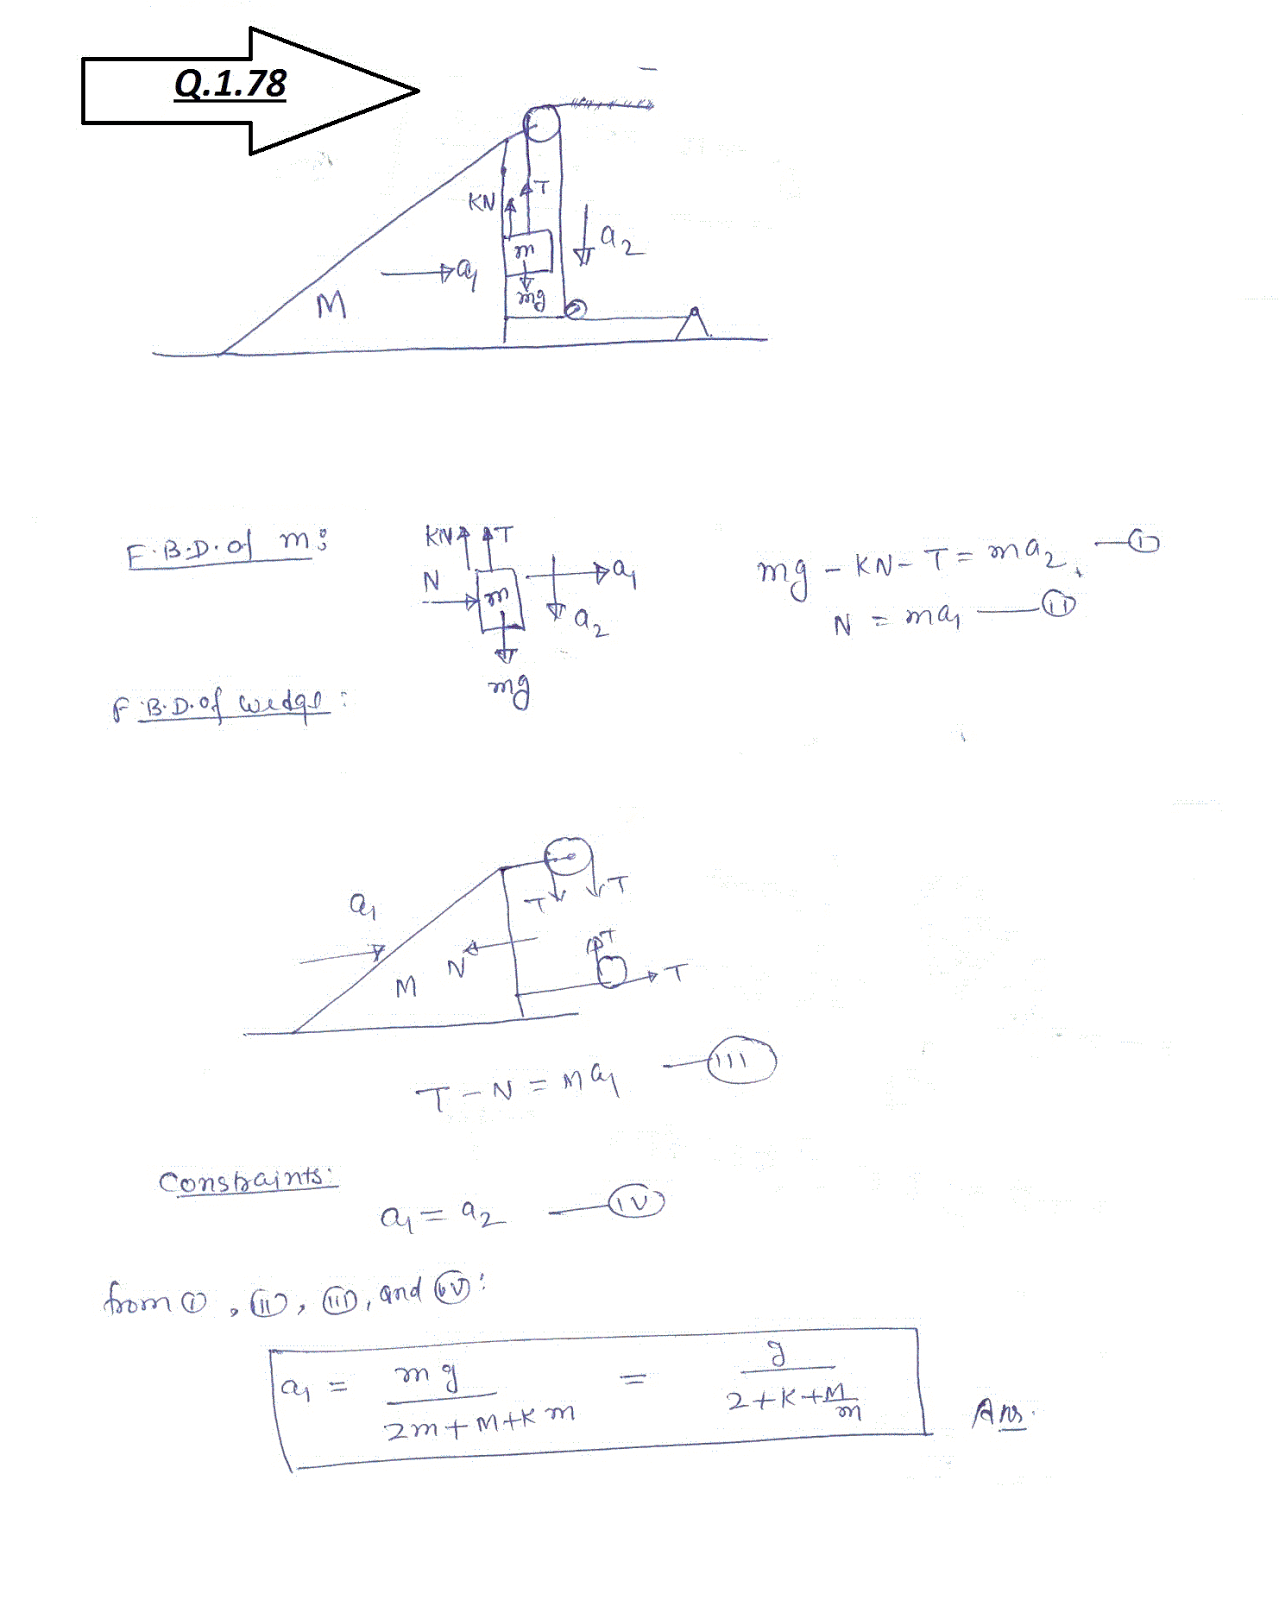 SOLUTIONS TO I E IRODOV BY RKH: problem 1.78